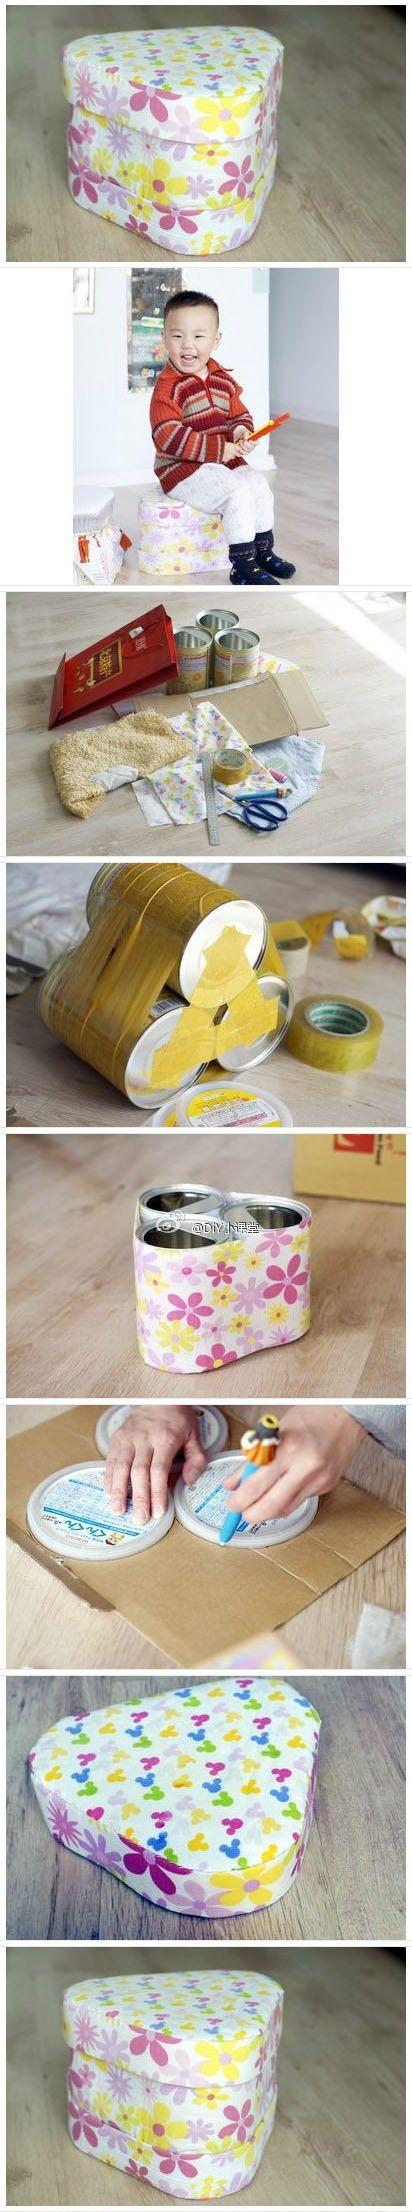 Easy Craft For Child | DIY & Crafts Tutorials